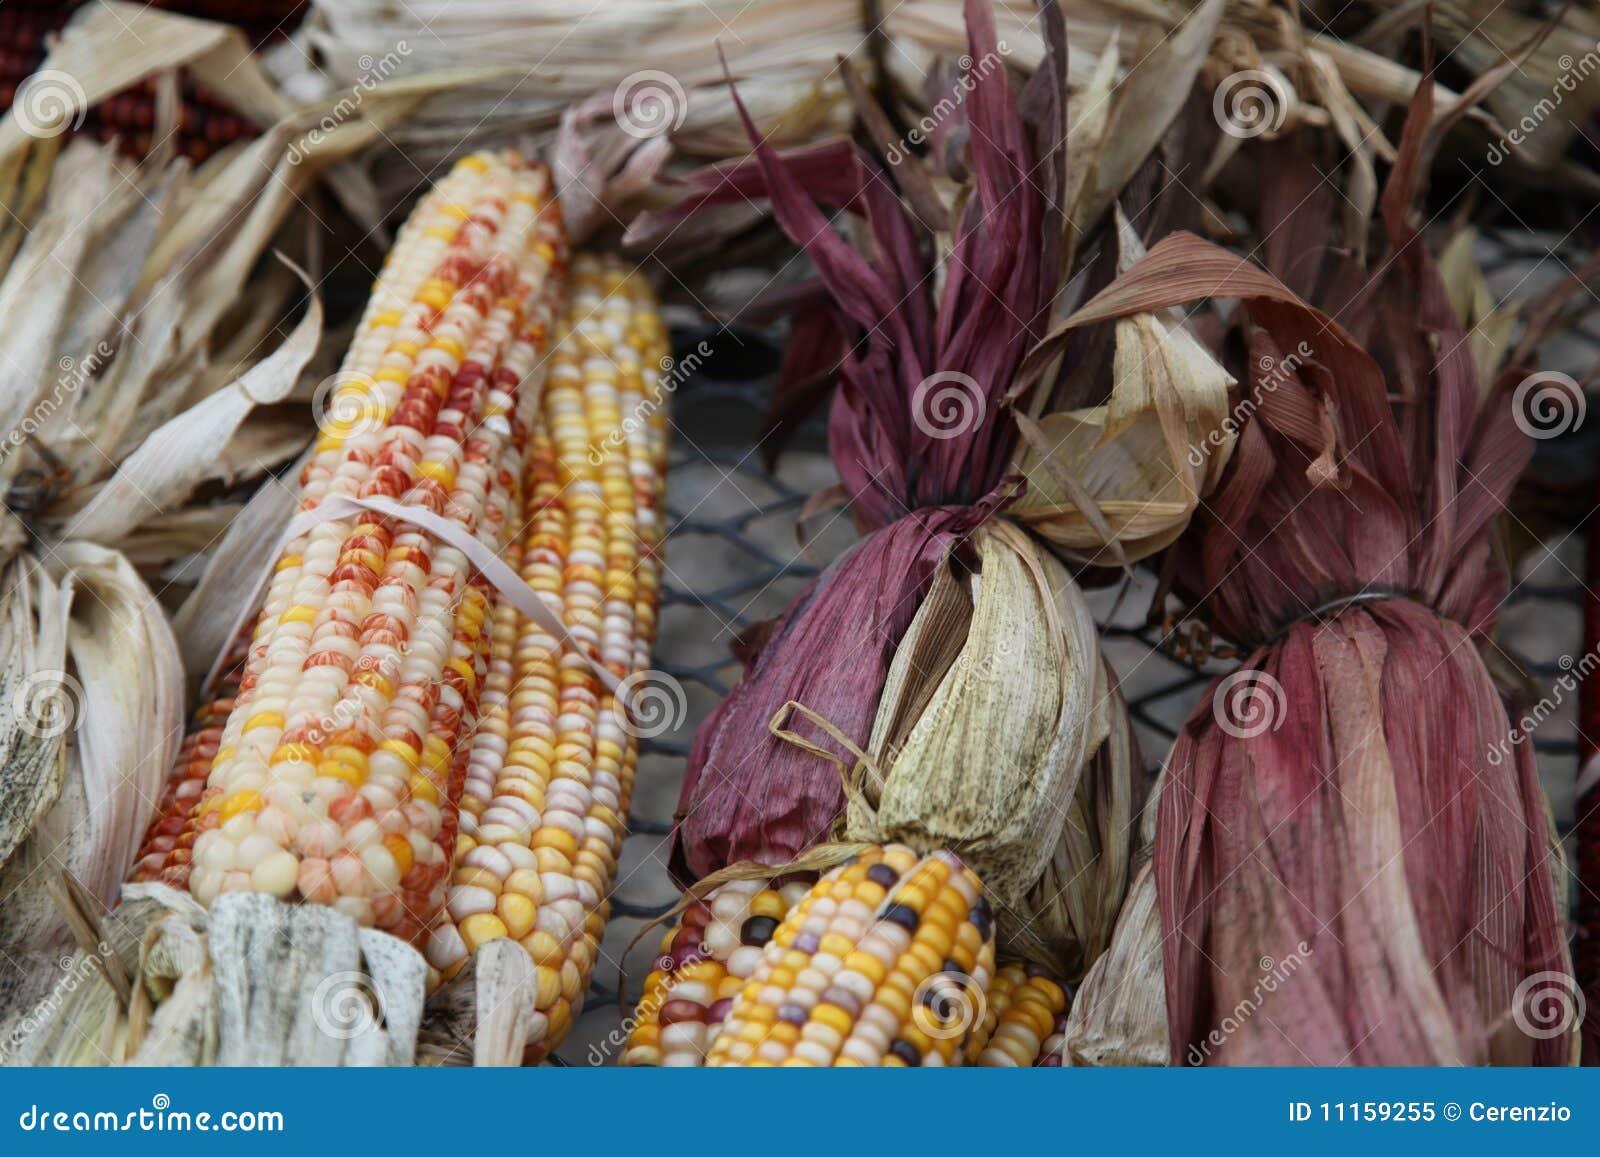 Kukurydzany labirynt pstrokacił